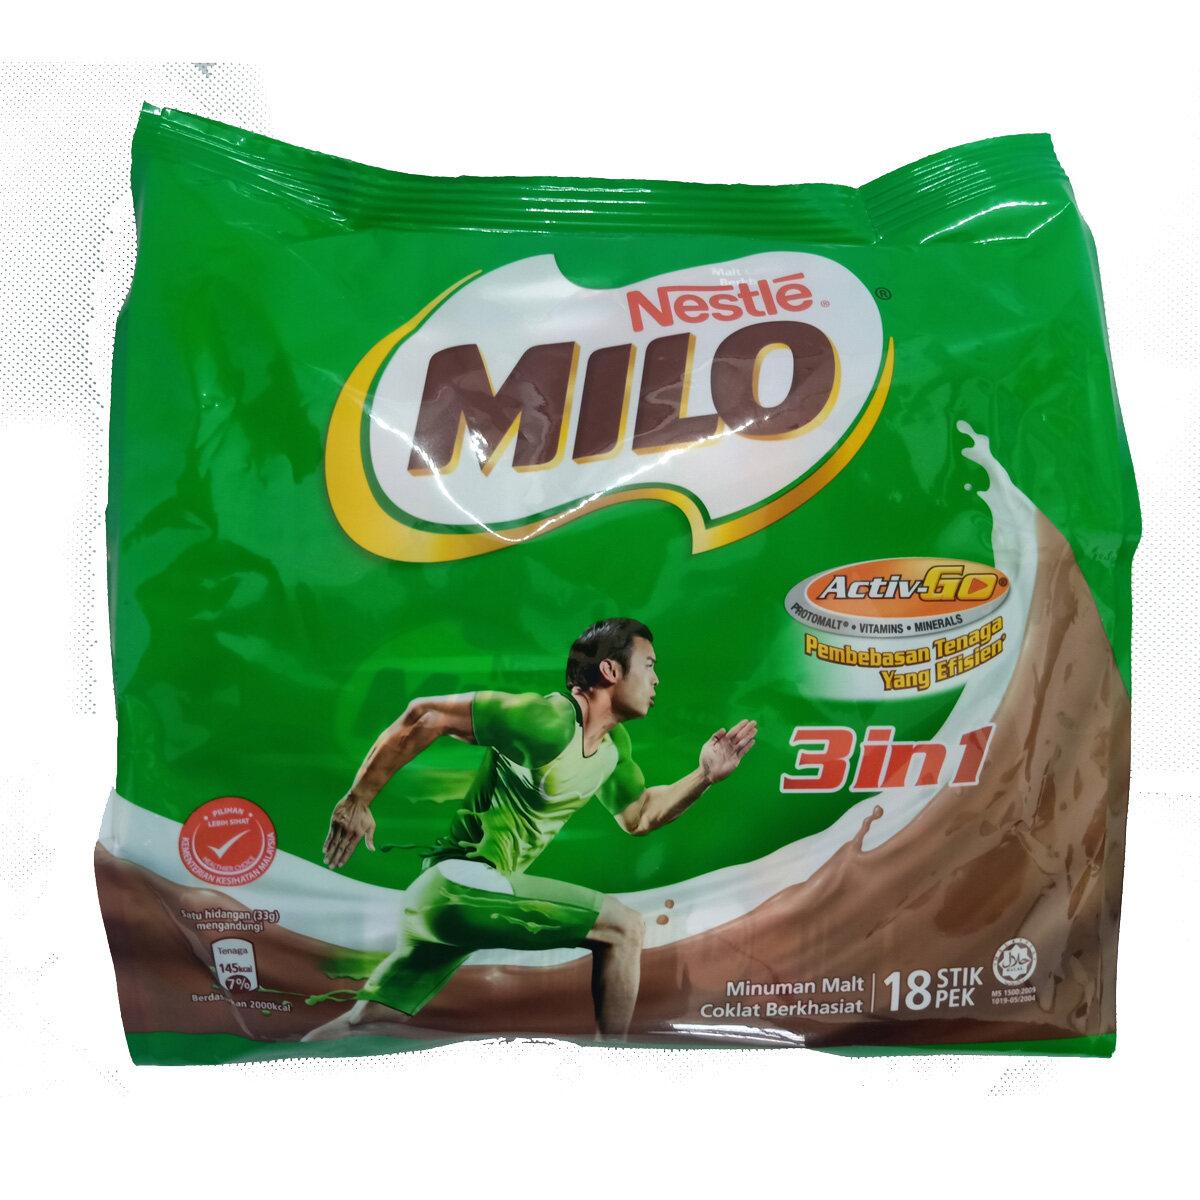 Nestl Milo Chocolate Malt Drink Activ-Go 3 In 1 (33g x 18 Sticks) x 3 Bags